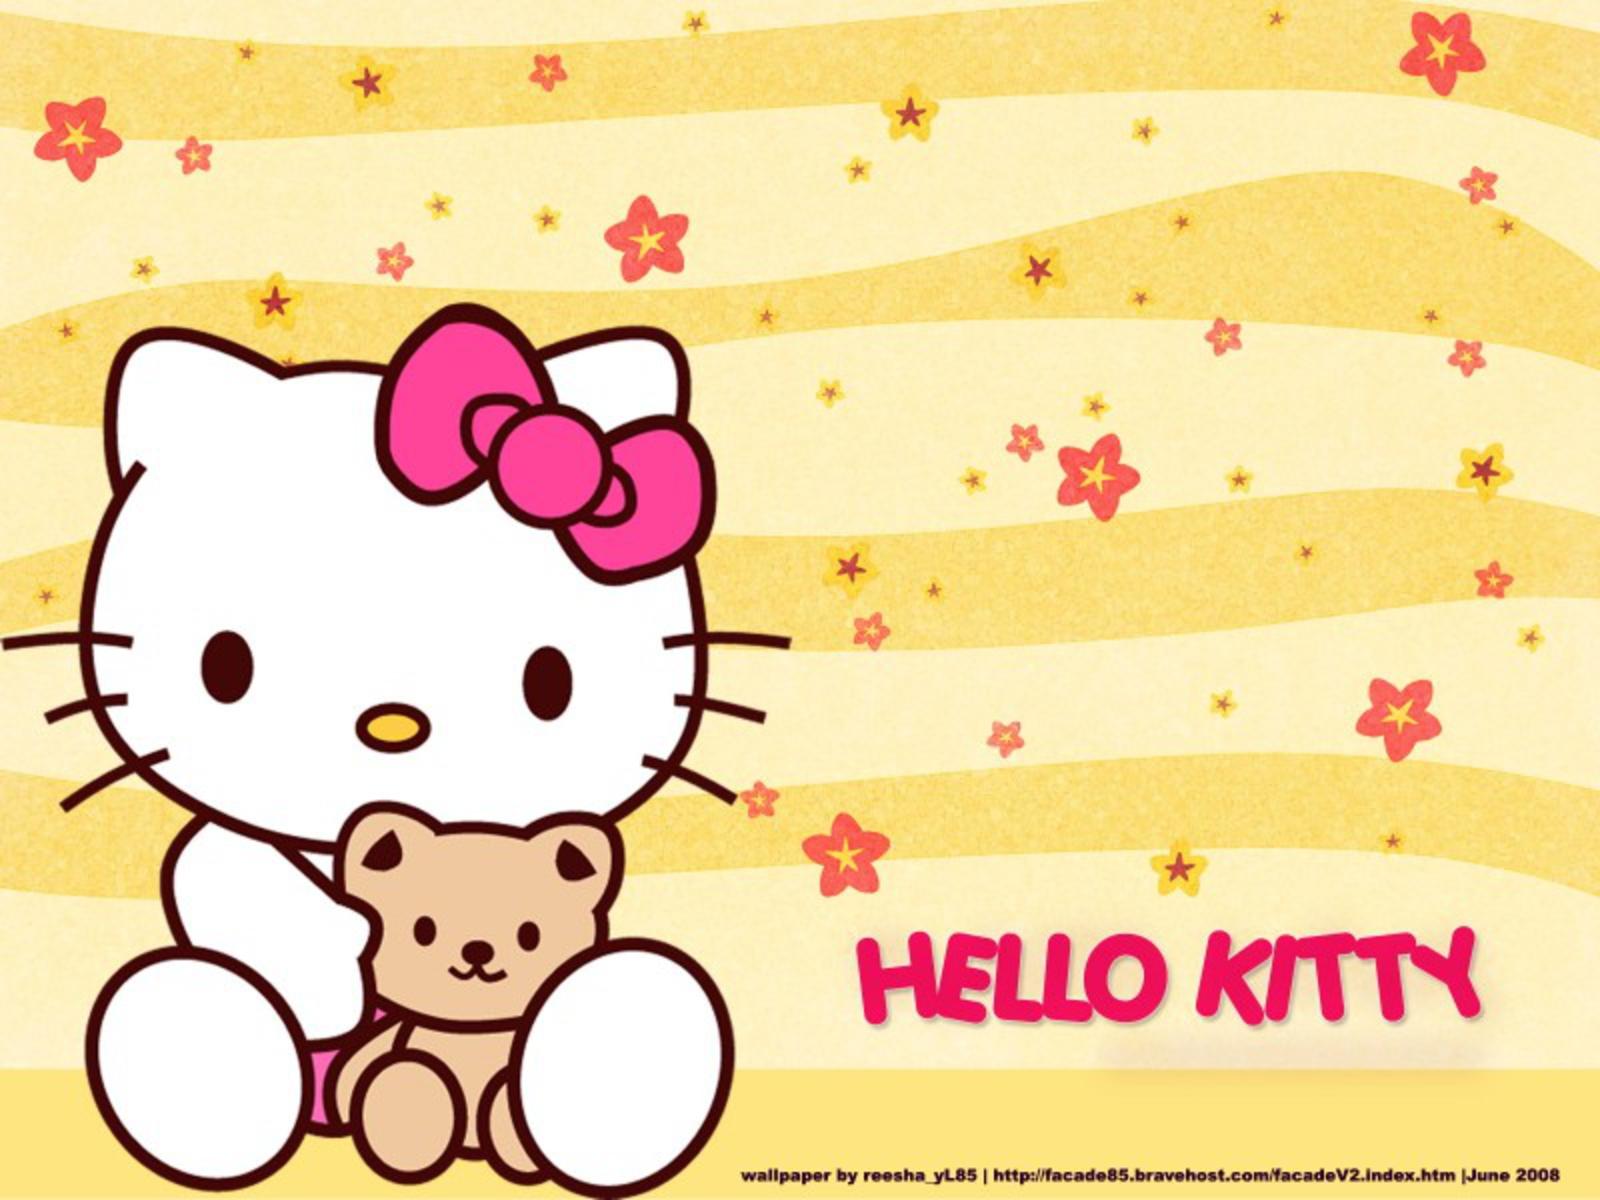 hello kitty hello kitty wallpaper 25605432 fanpop. Black Bedroom Furniture Sets. Home Design Ideas